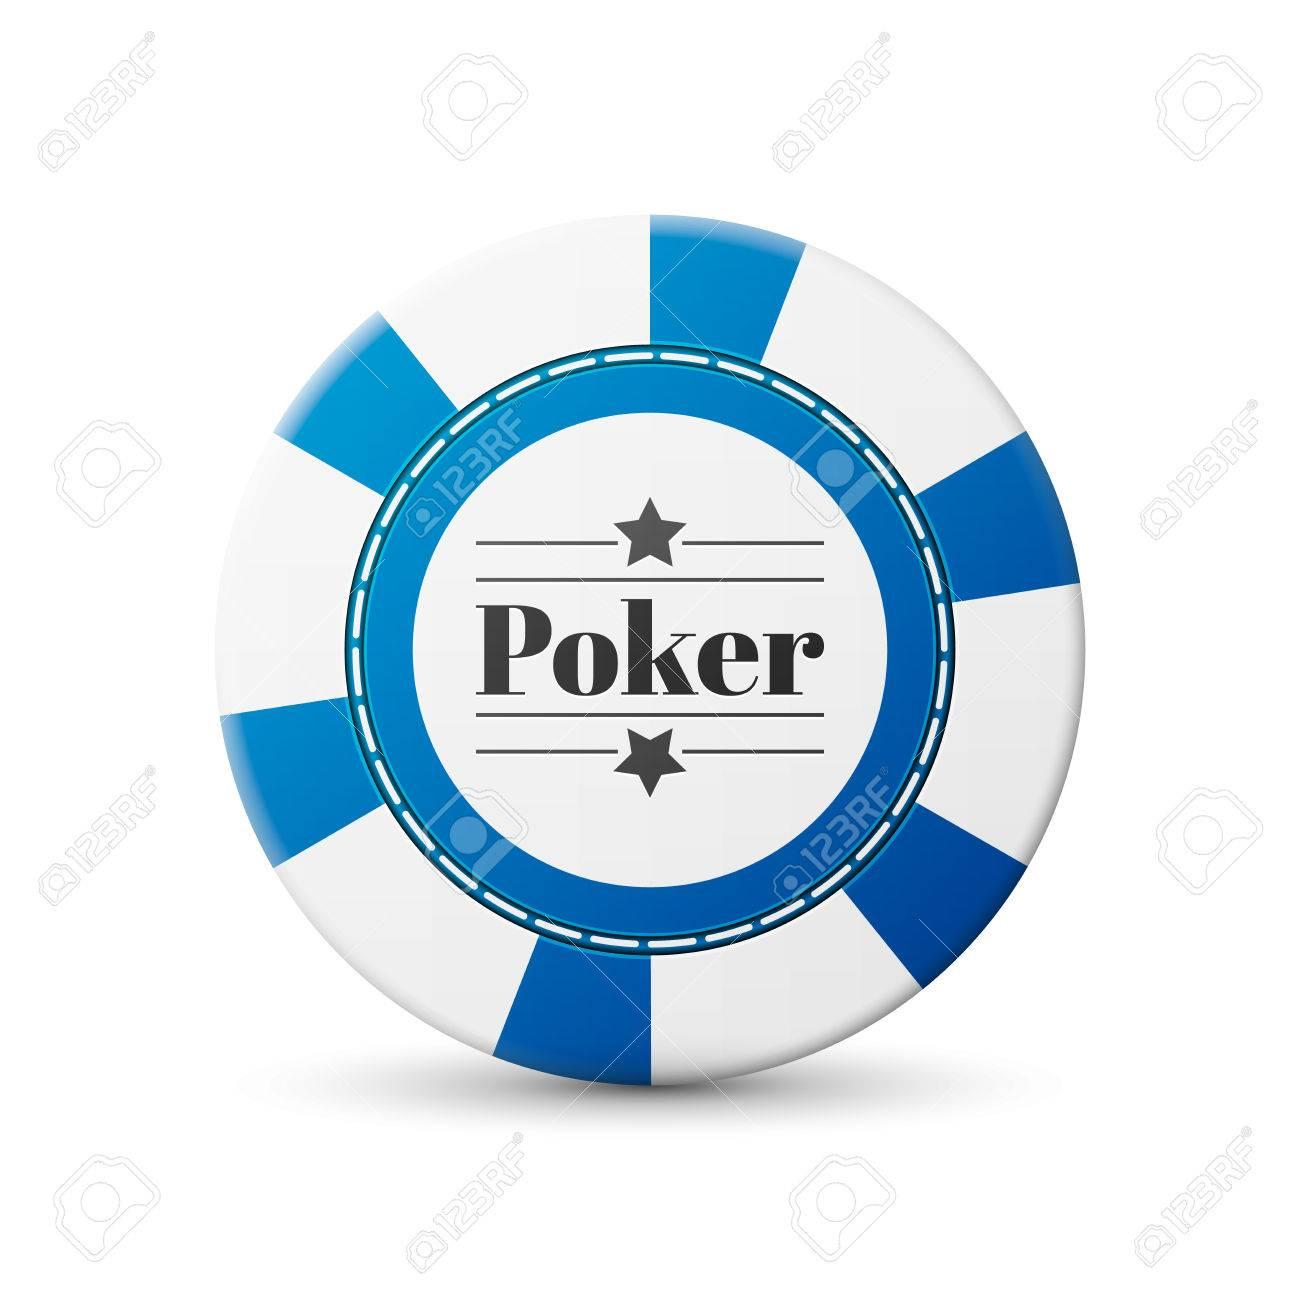 single blue casino chip isolated on white background - 43119036